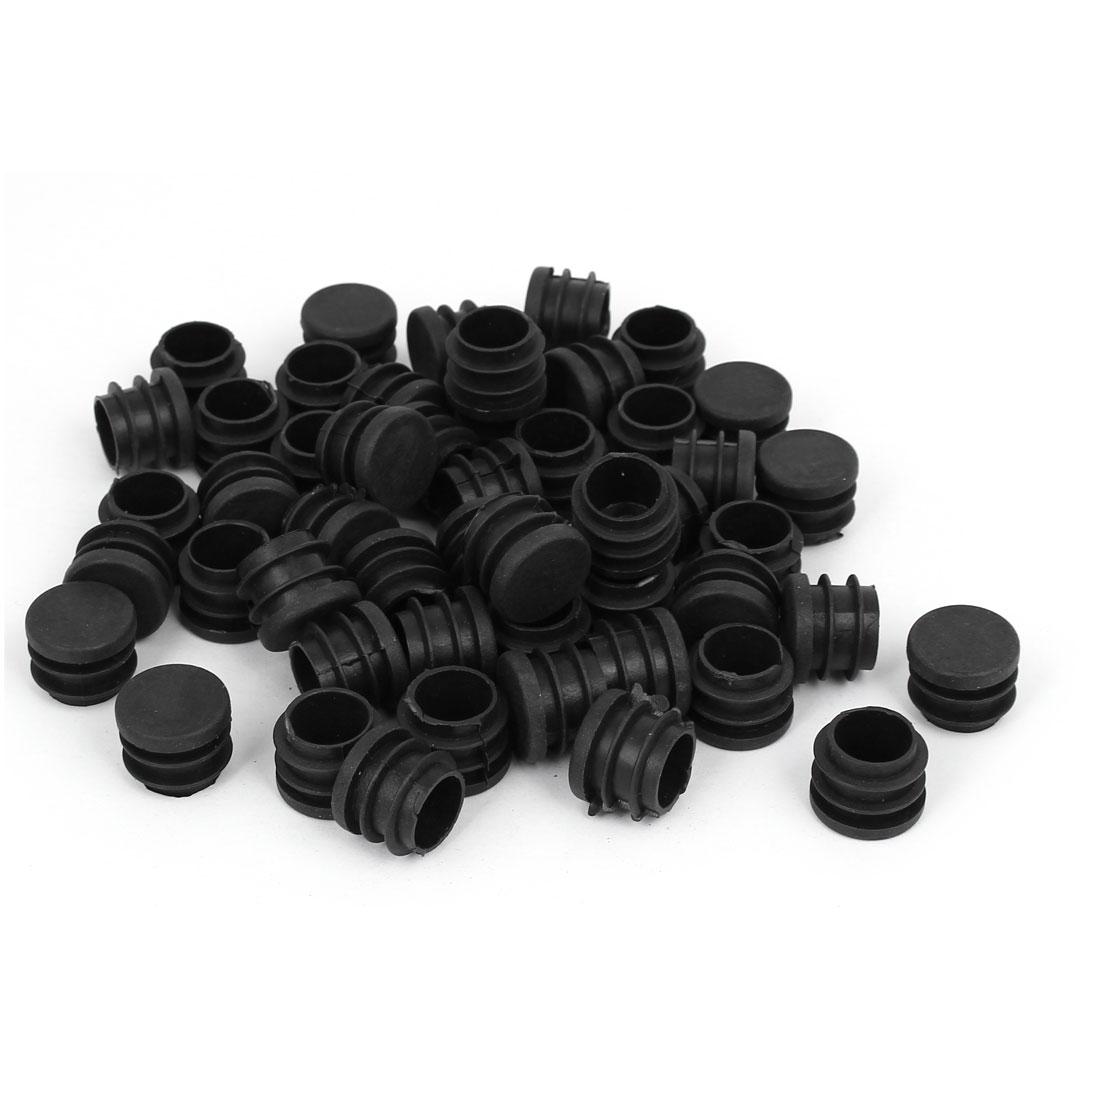 19mm Dia Plastic Blanking End Cap Round Ribbed Tube Insert Black 50pcs